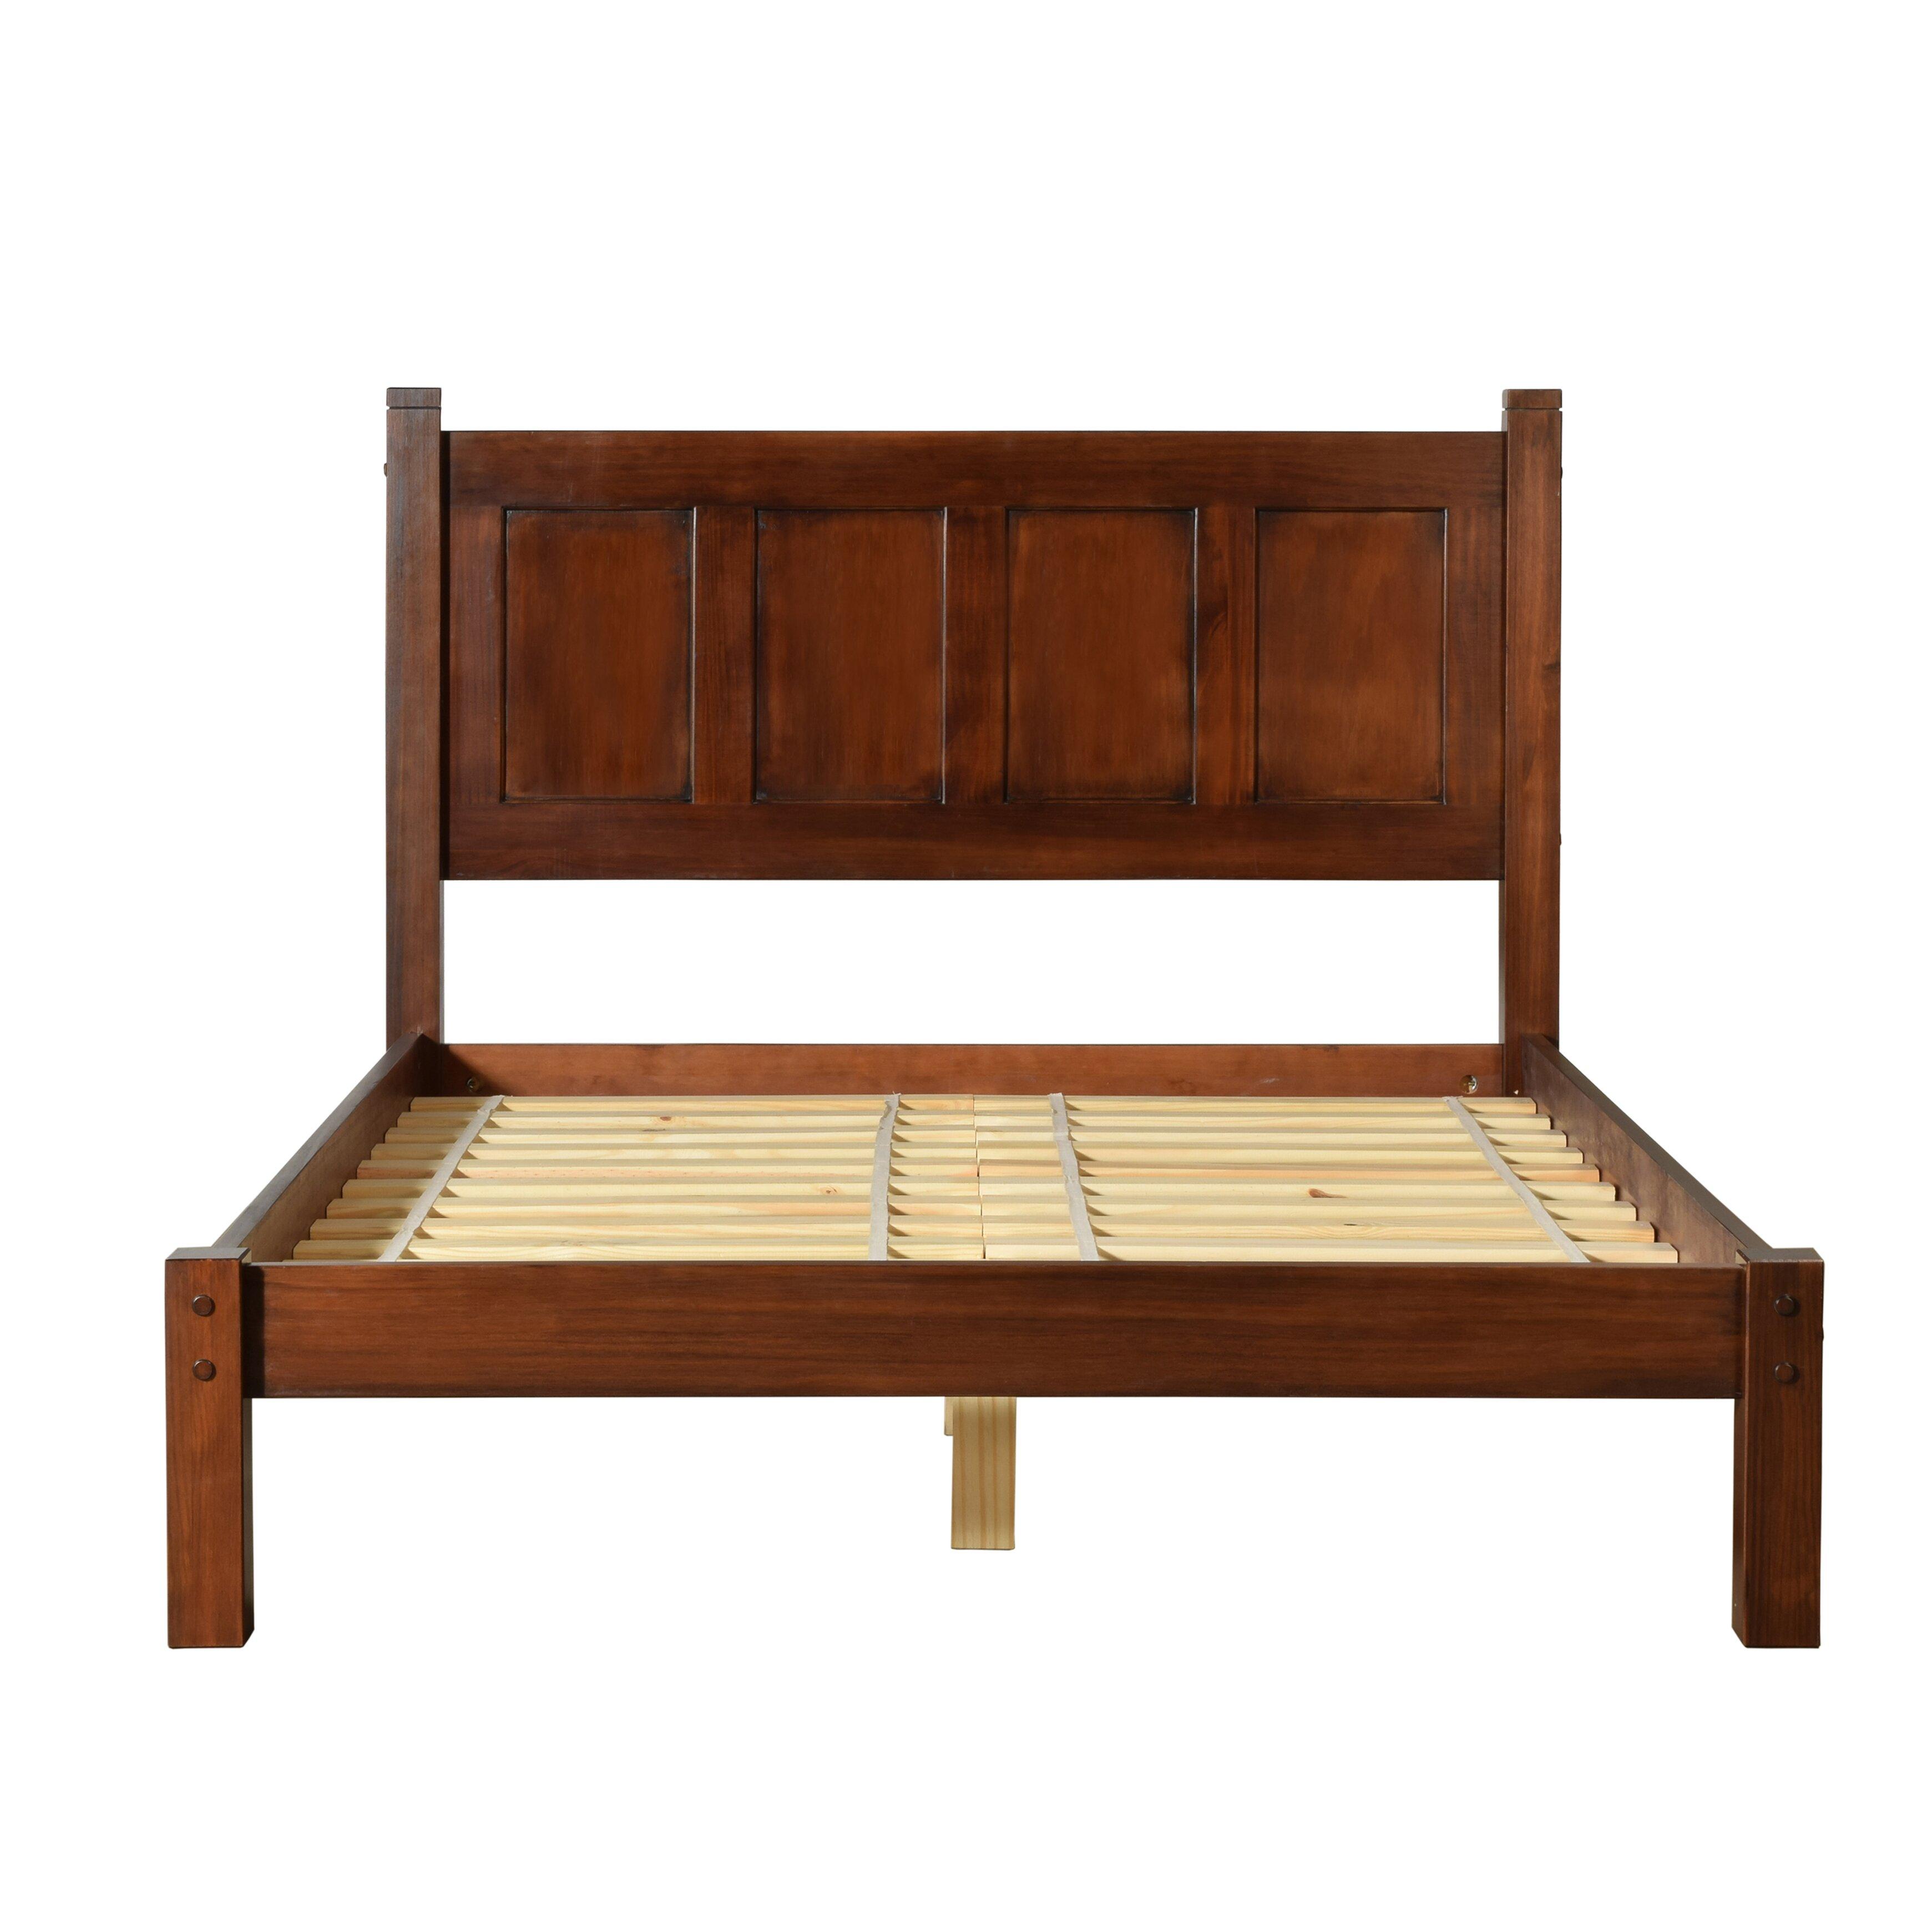 Shaker Bedroom Furniture Grain Wood Furniture Shaker Platform Bed Reviews Wayfair